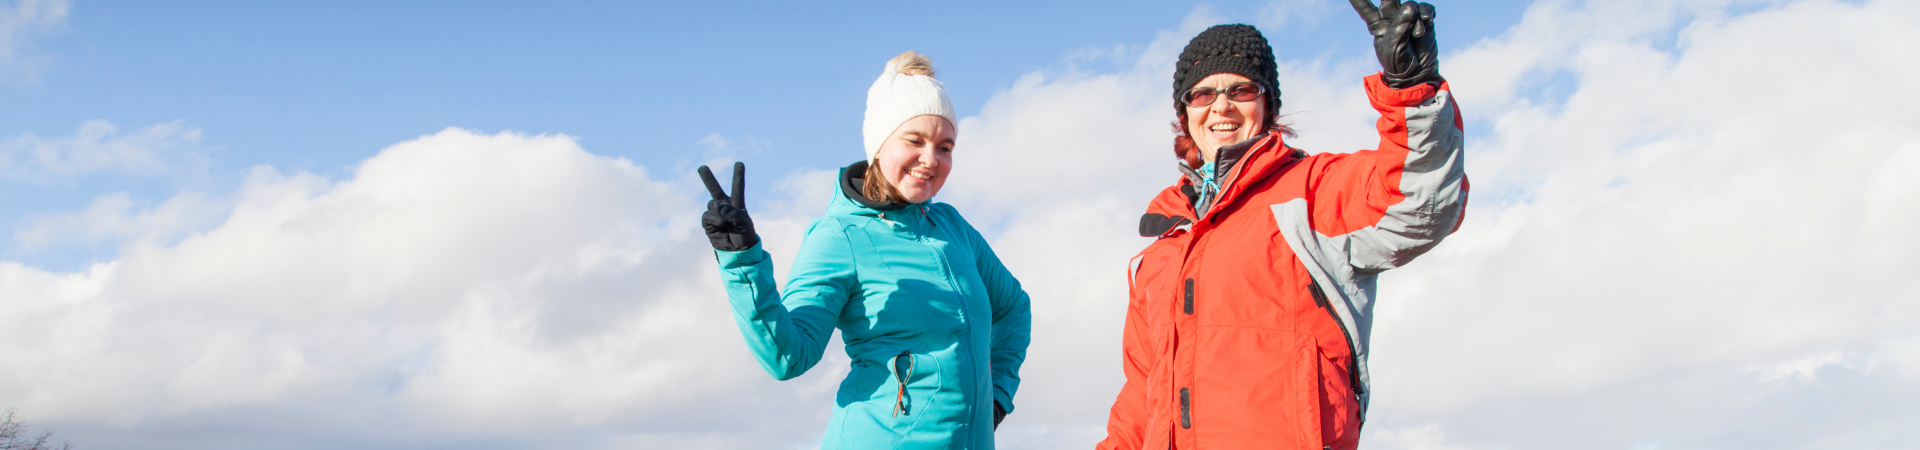 201911366 - DGH Climb Your Mountain WOMEN slider